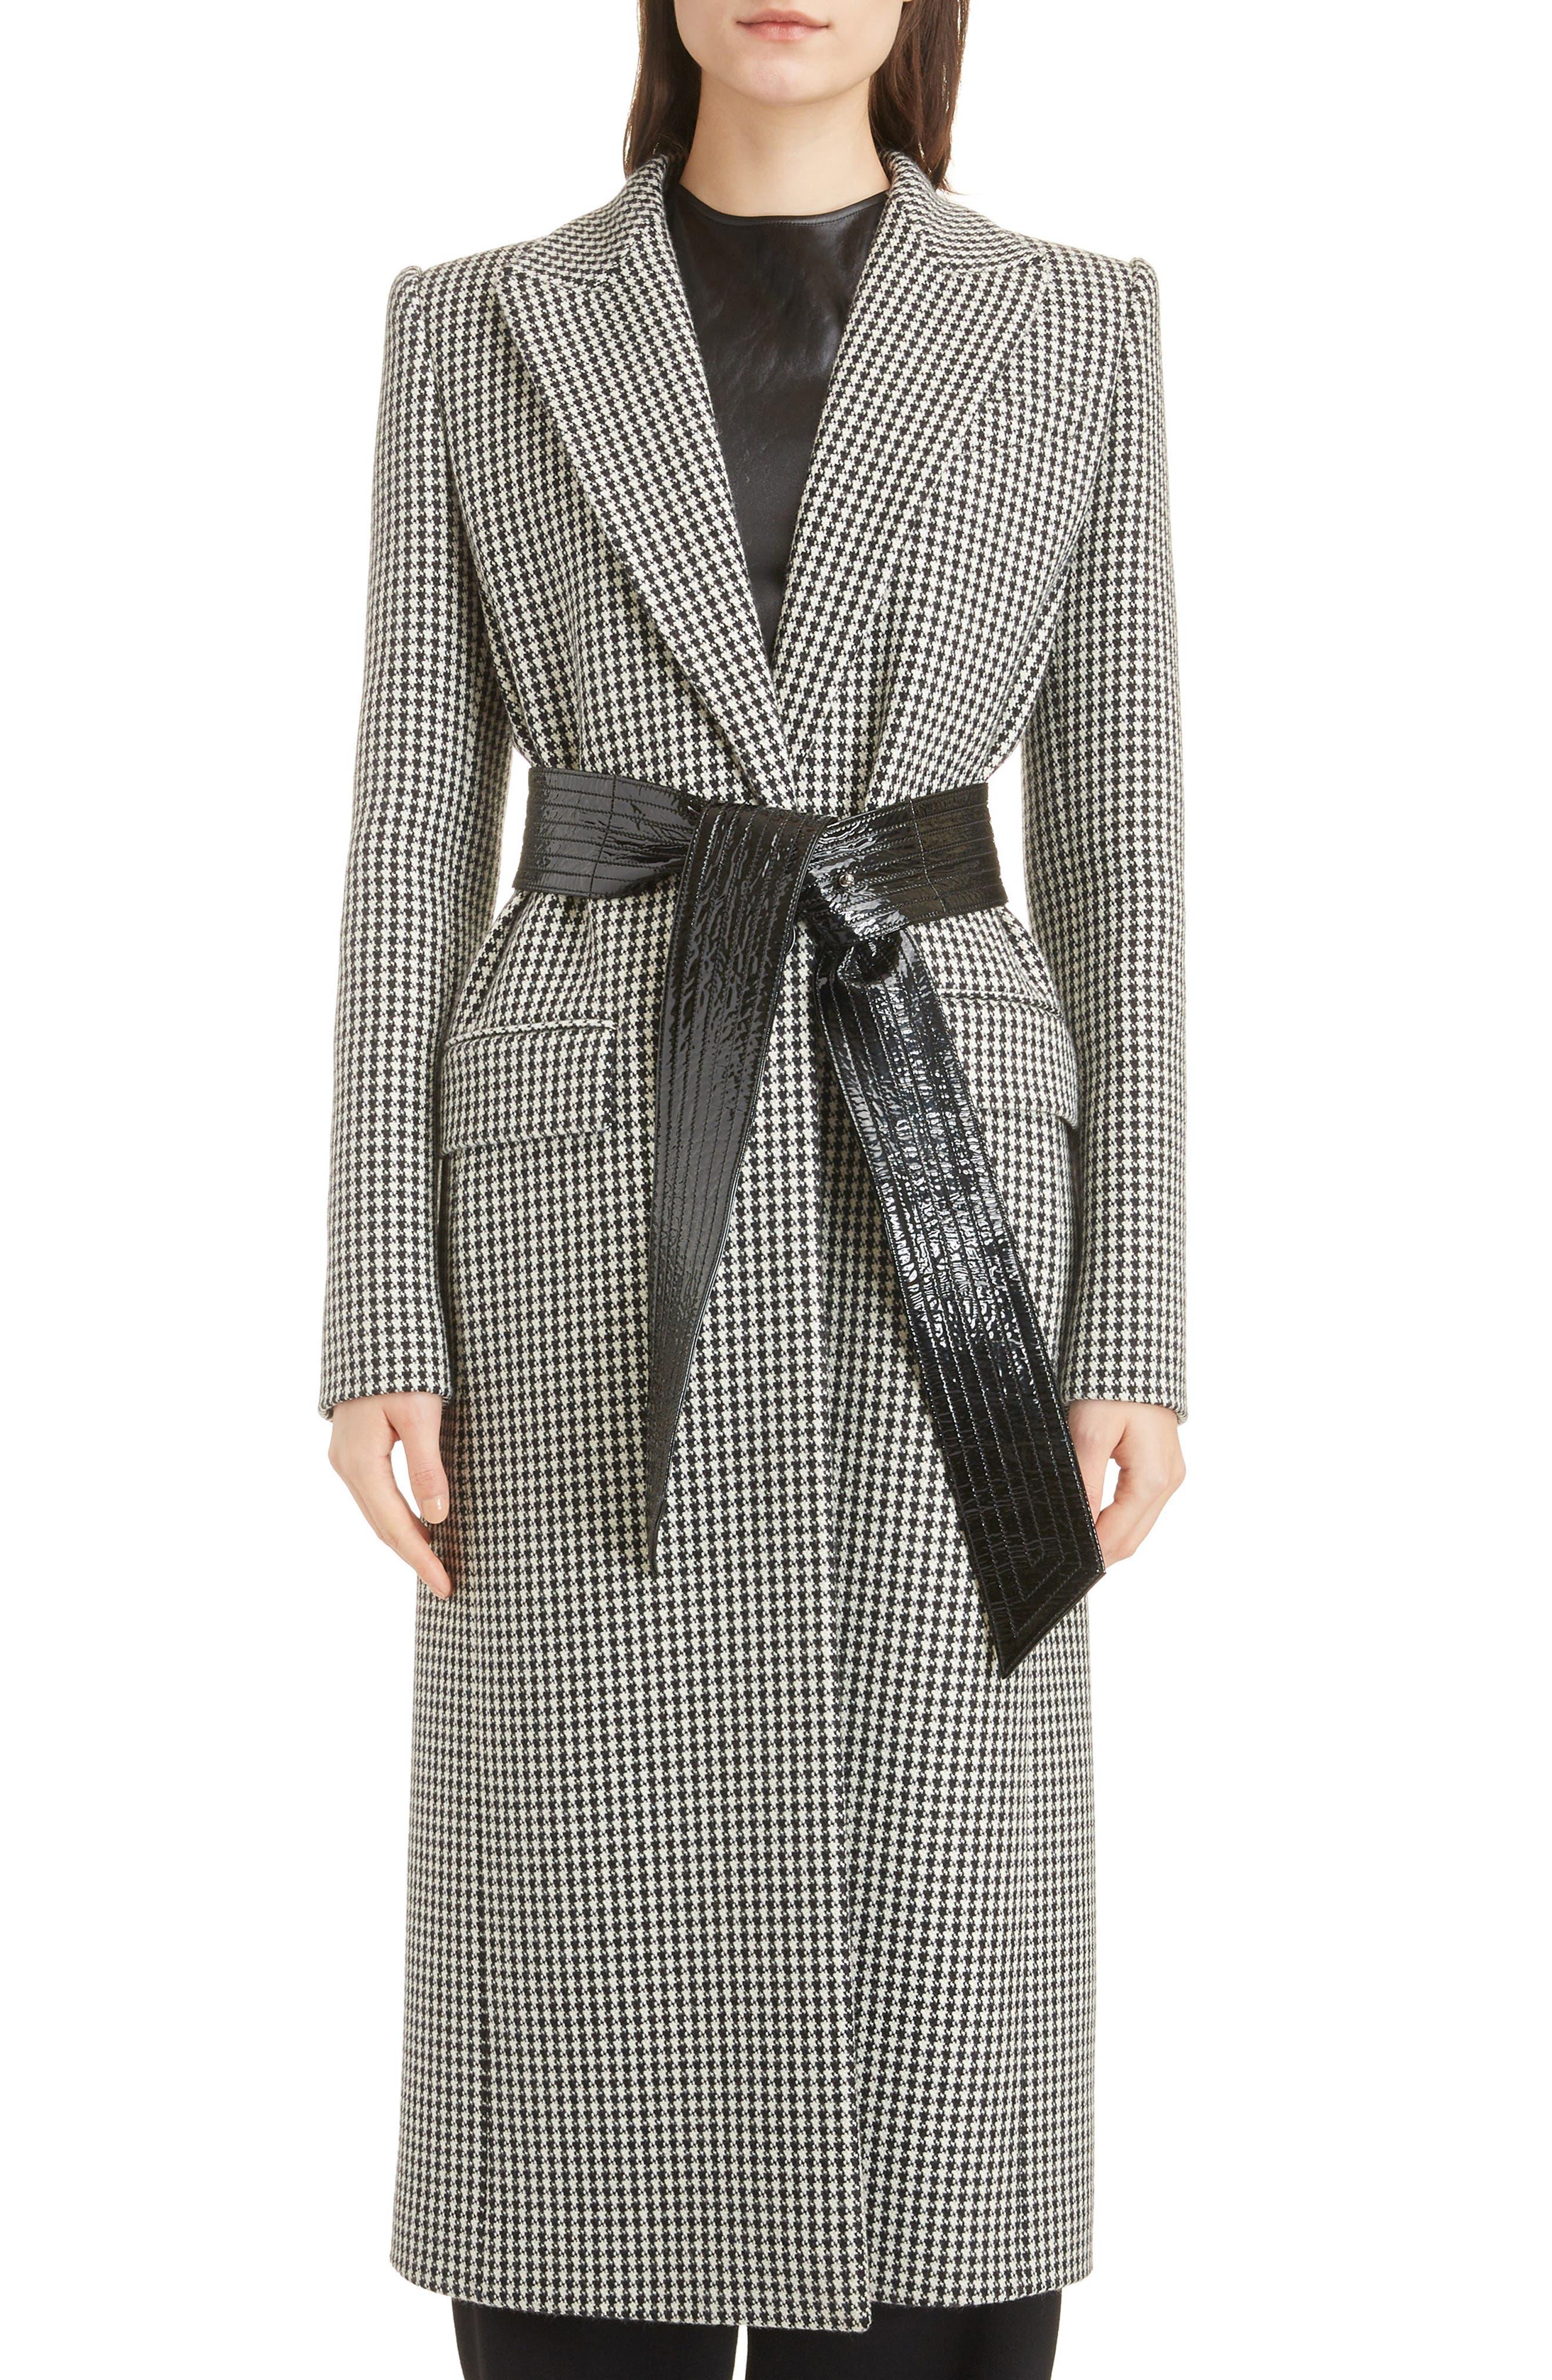 Houndstooth Wool Coat,                         Main,                         color, BLACK NATURAL